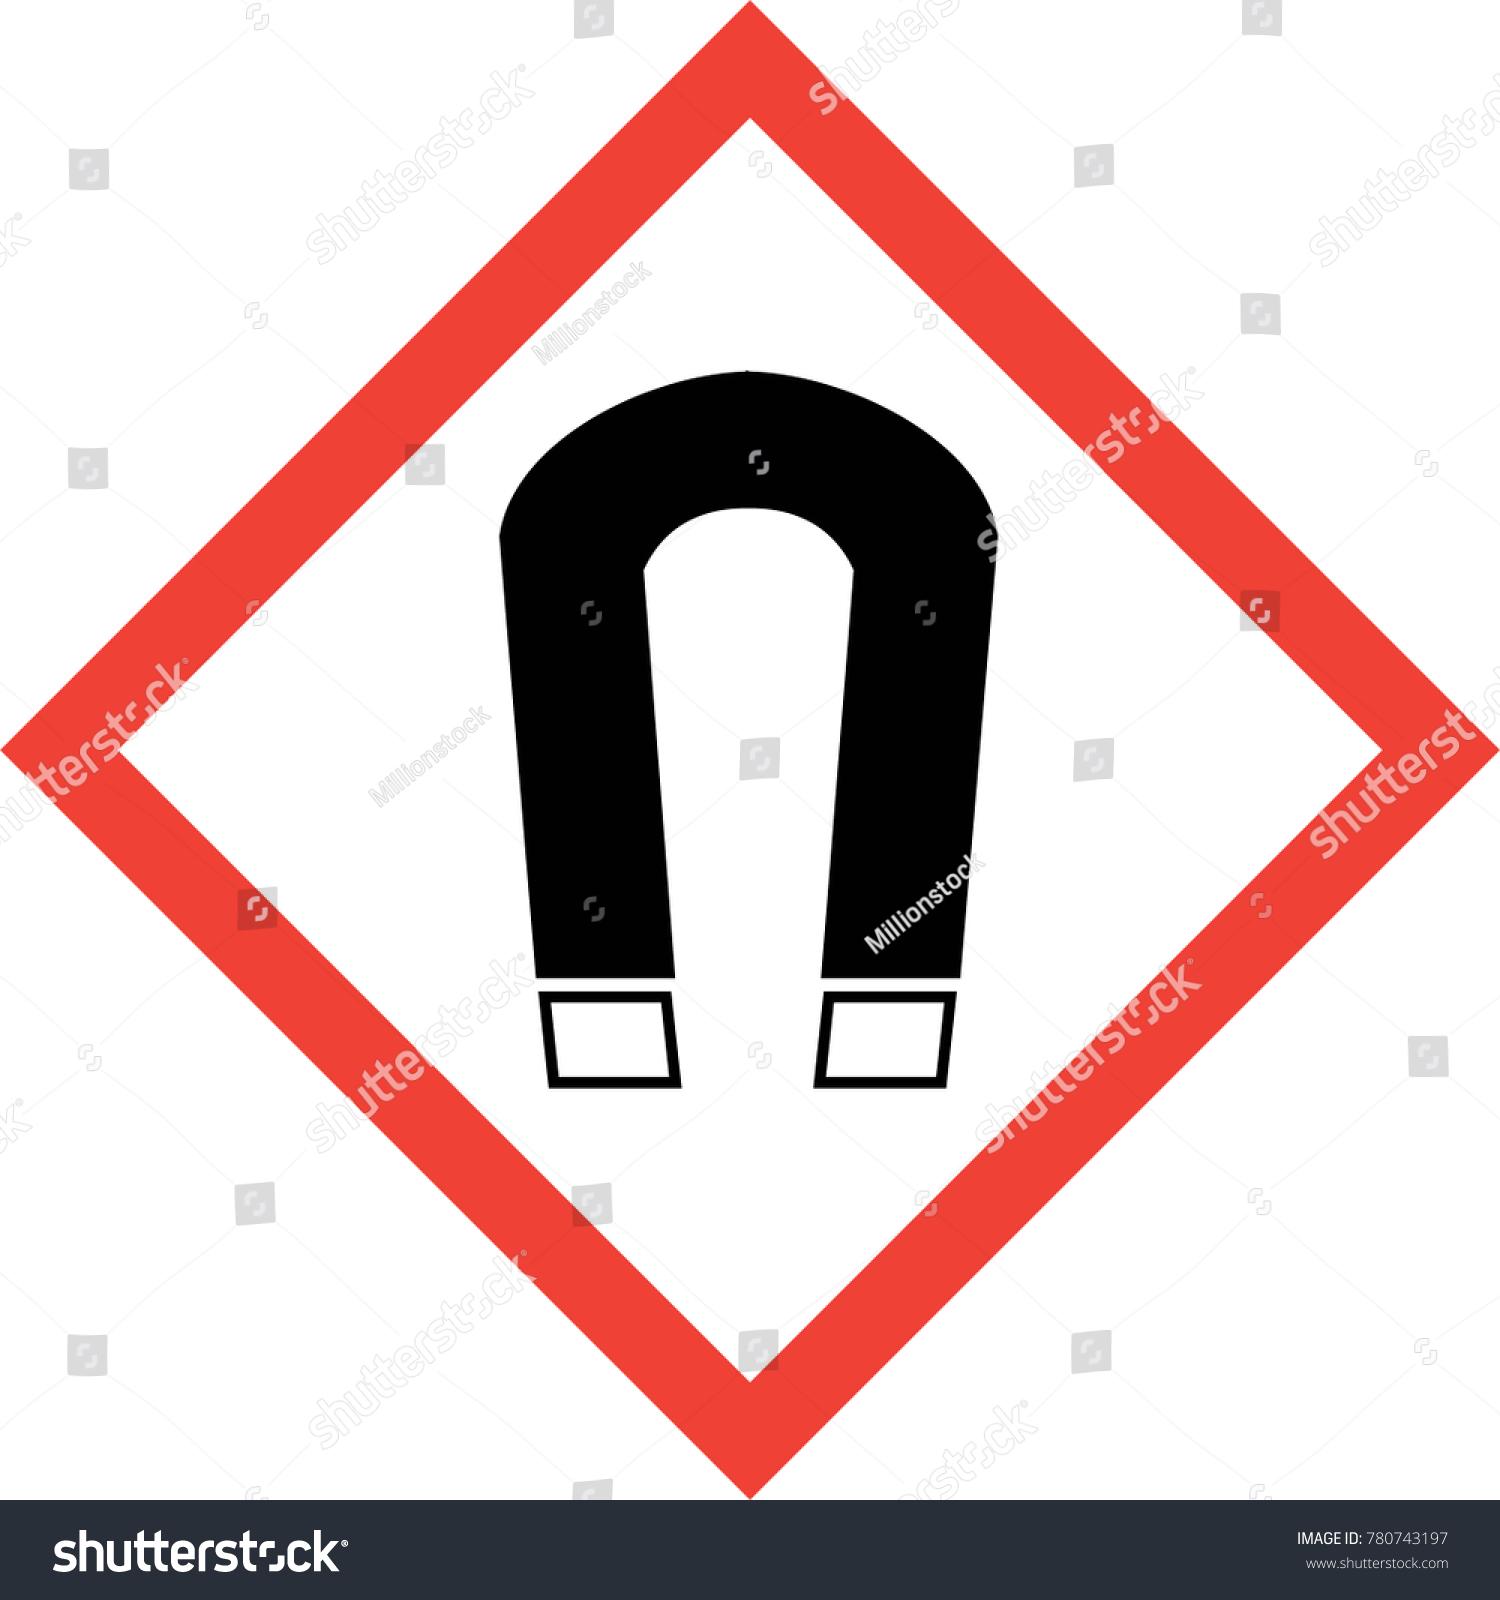 Royalty Free Stock Illustration Of Hazard Sign Magnetic Field Symbol